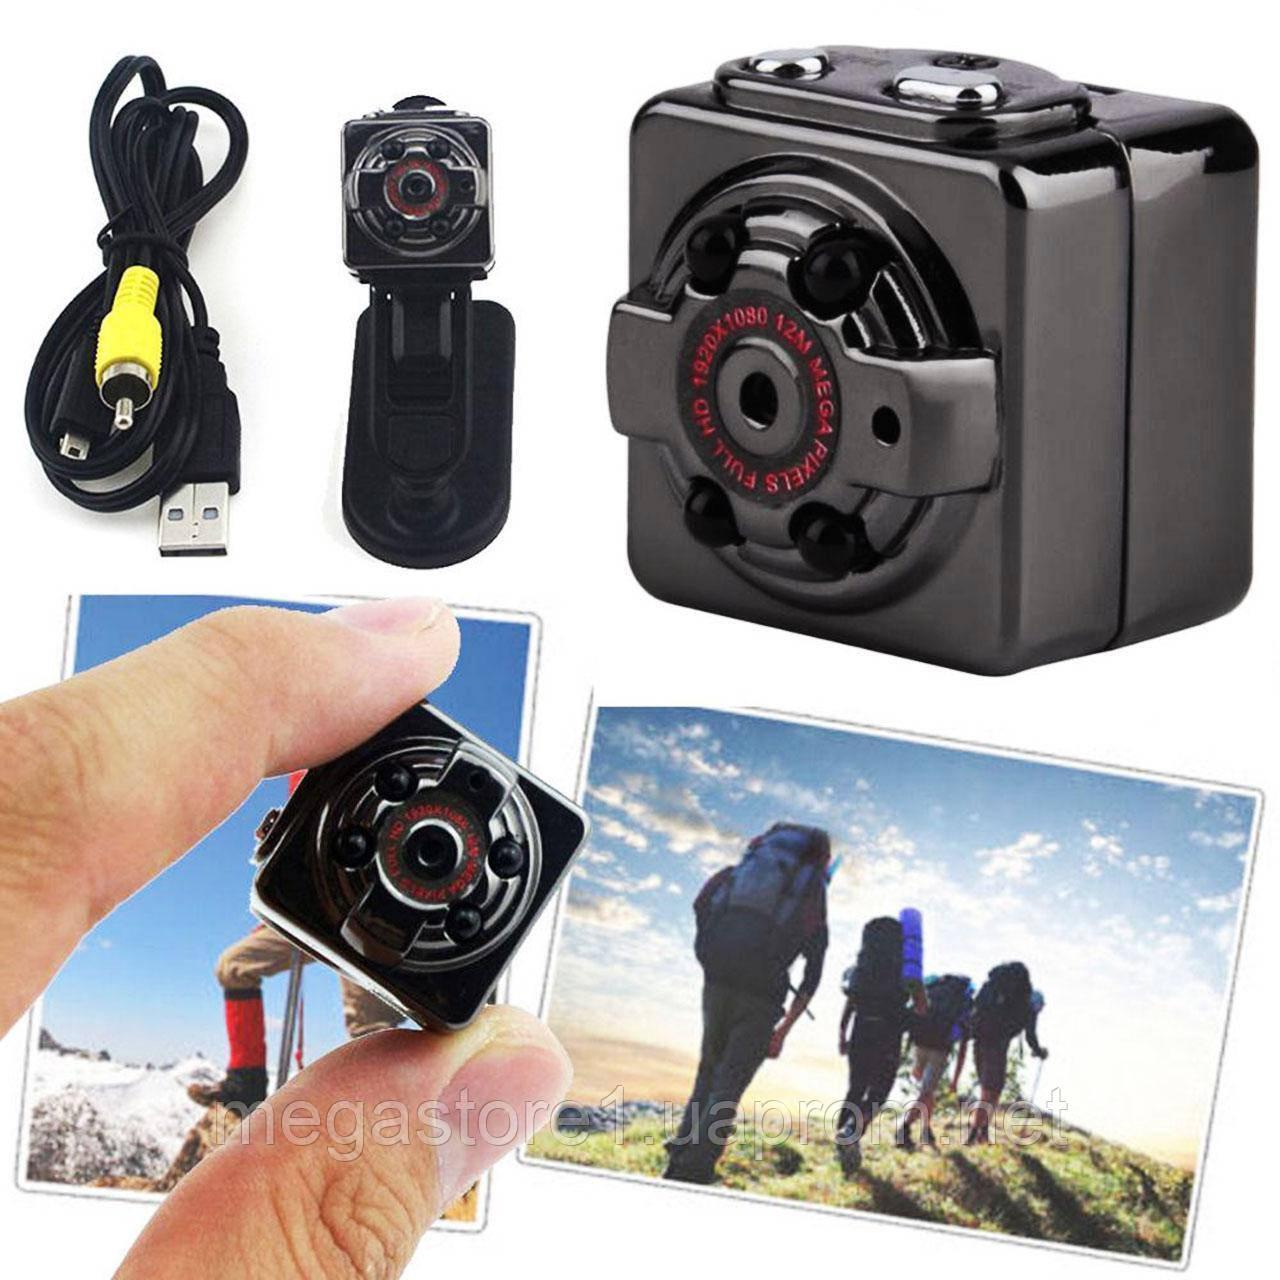 Мини камера, Видеорегистратор SQ8 12MP 1080P Full HD датчик движения,